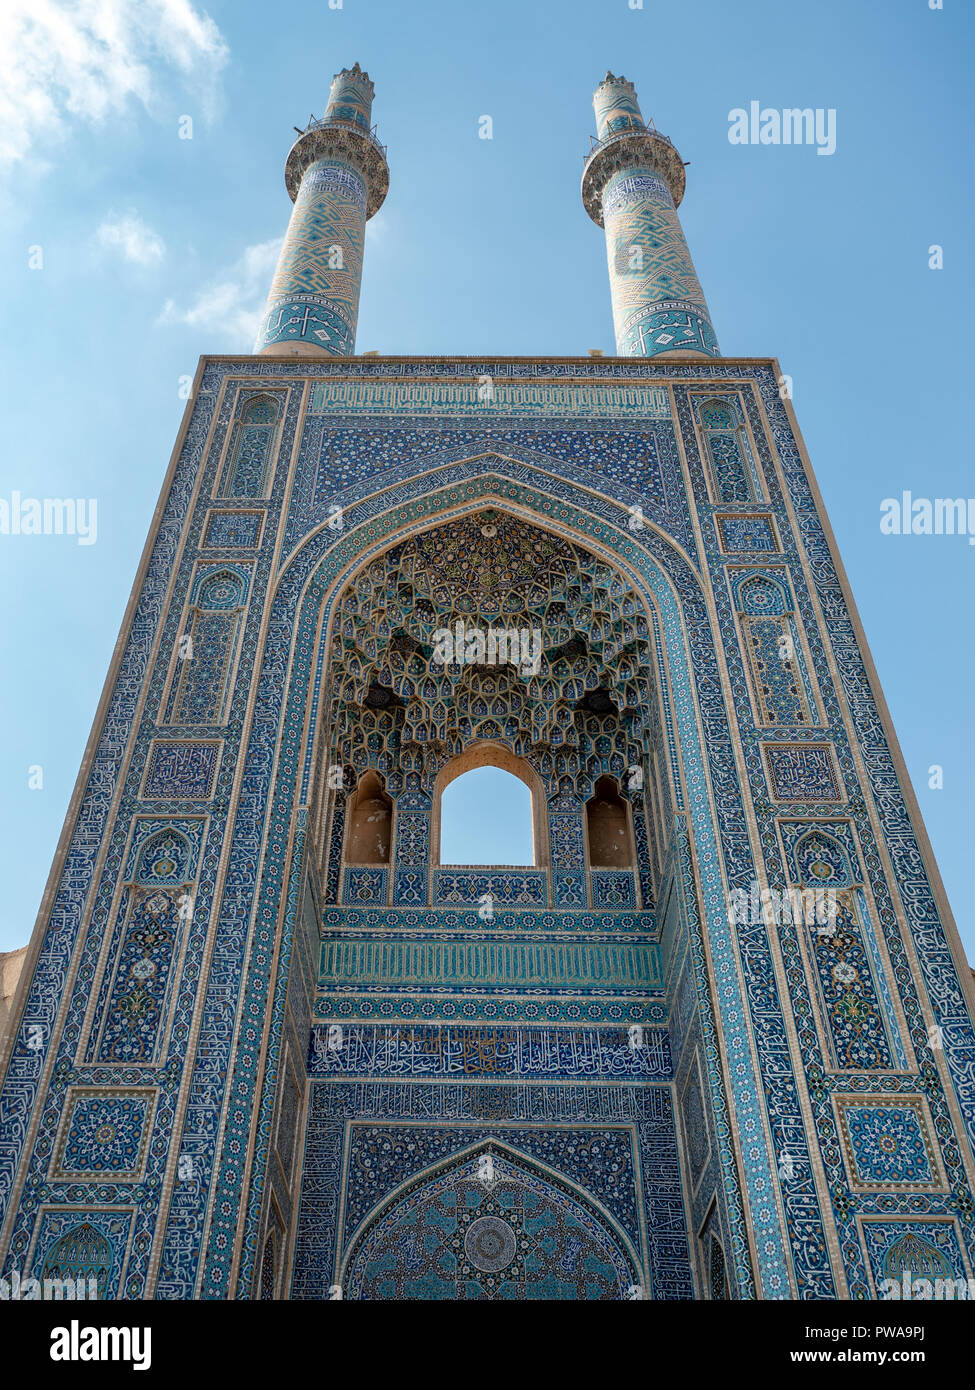 Grand iwan of Jameh mosque, Yazd, Iran - Stock Image